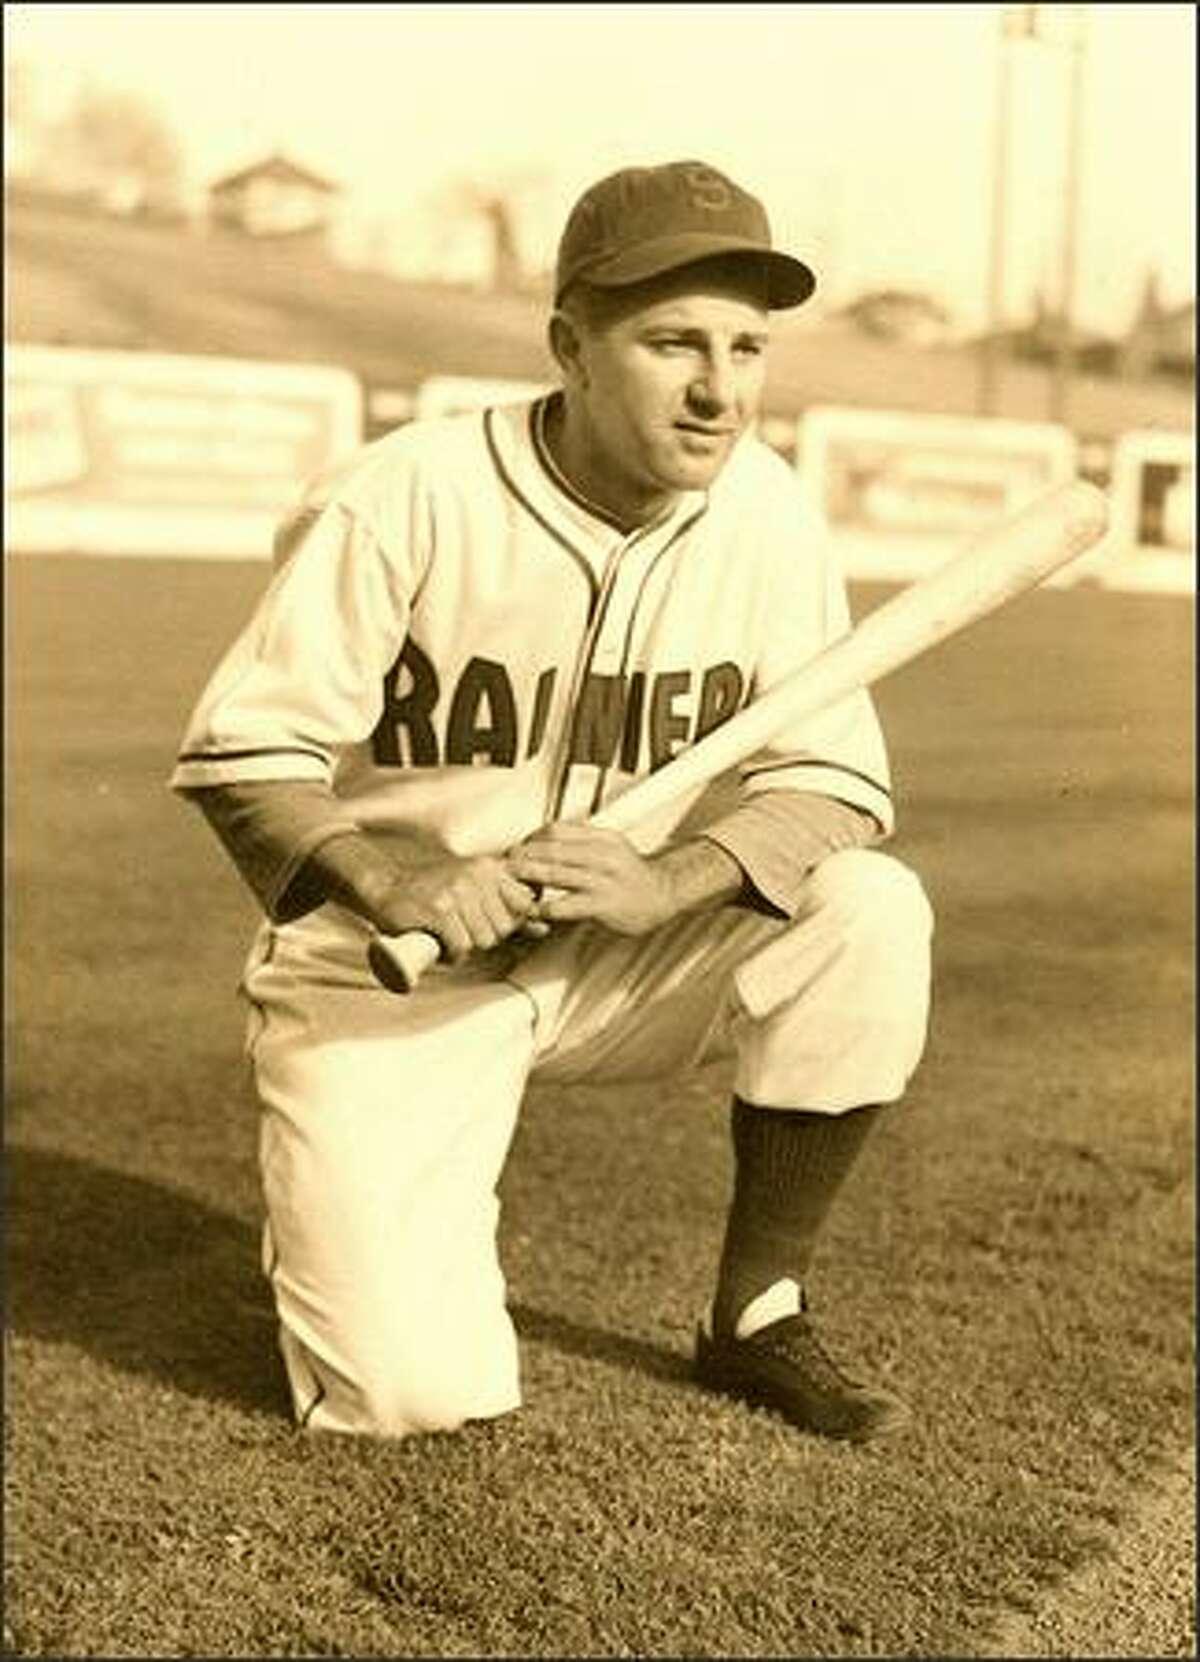 Edo Vanni as a Seattle Rainier at Sicks' Stadium in 1946.